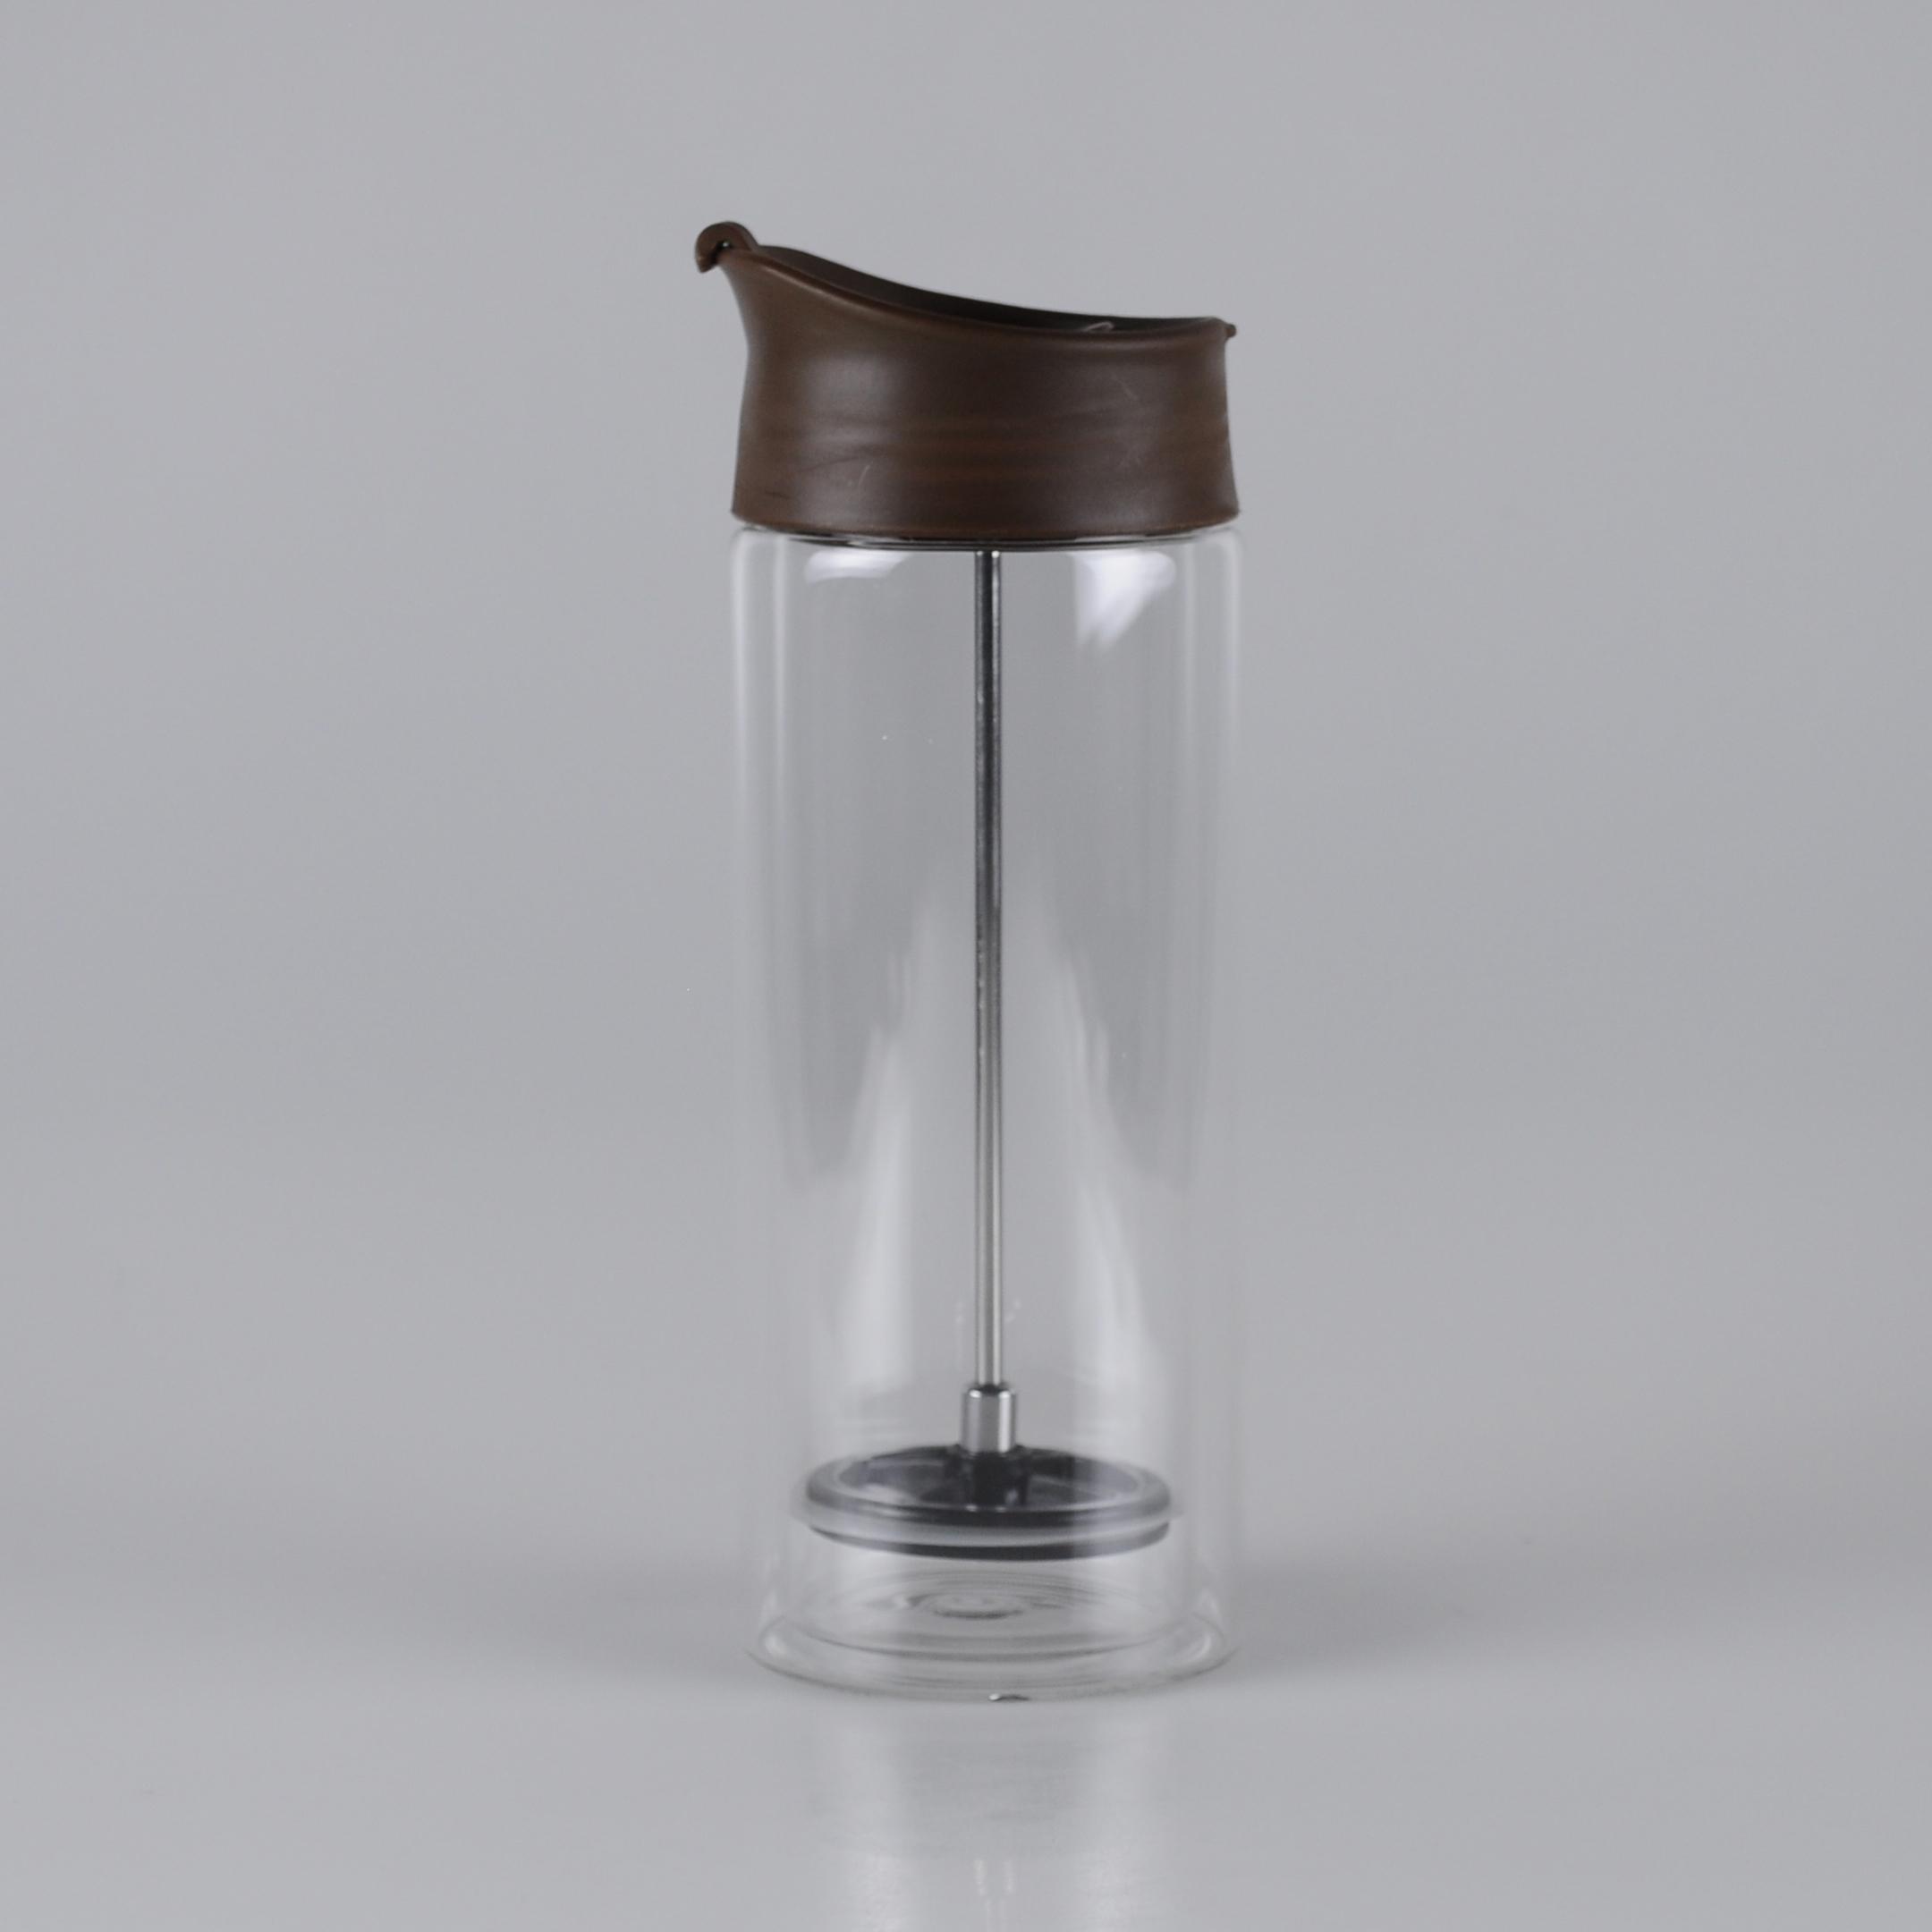 500ml-flip-top-lid-double-wall-glass-bottle-with-tea-infuser (1)